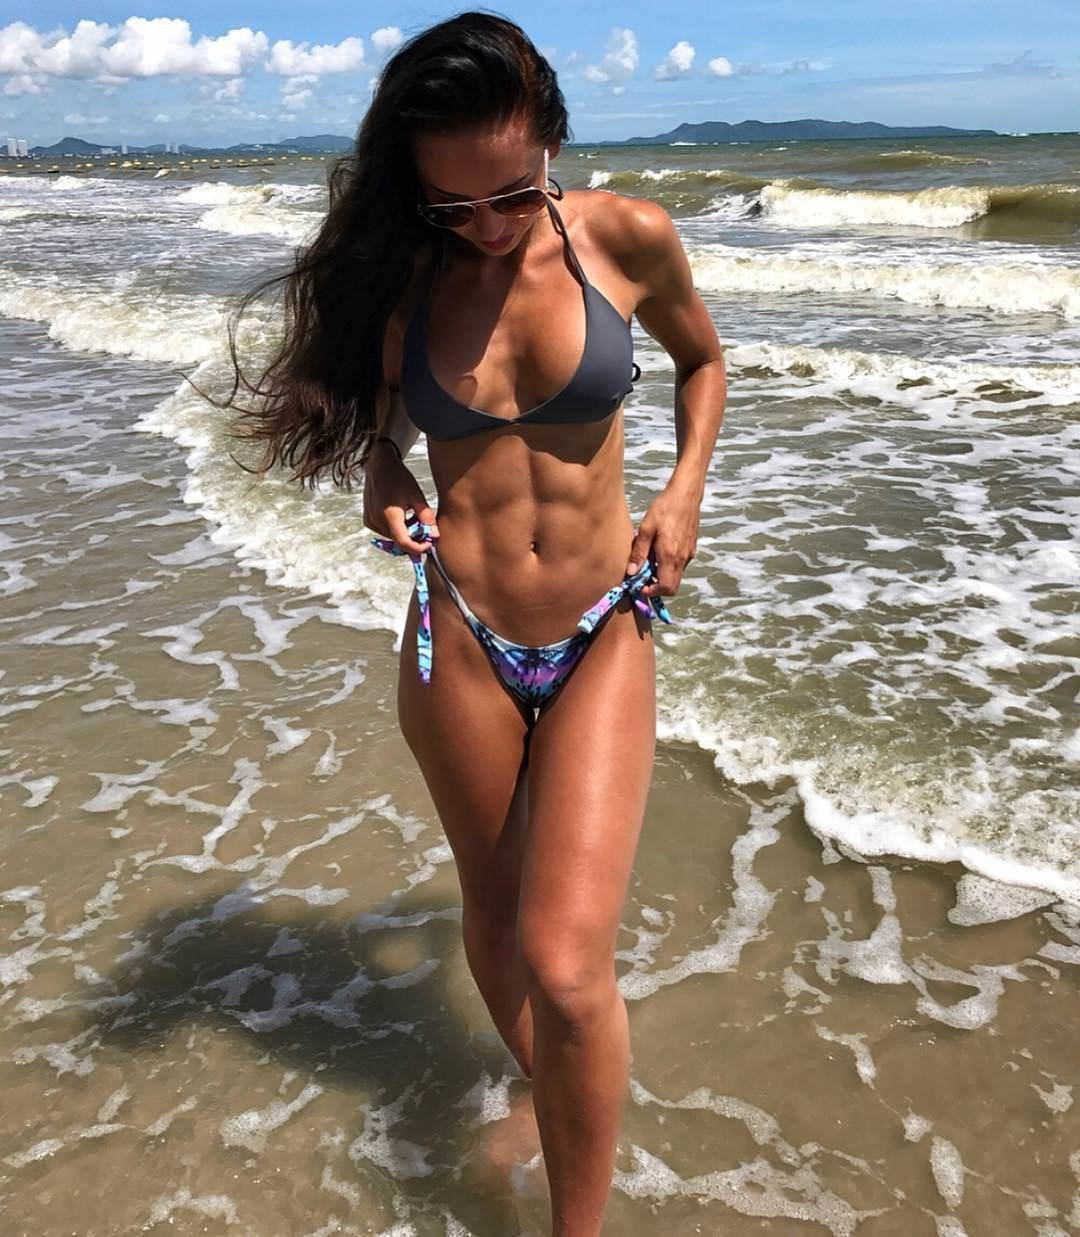 Pictures Sanna-Maria Seilamo nudes (88 photos), Pussy, Hot, Feet, in bikini 2015